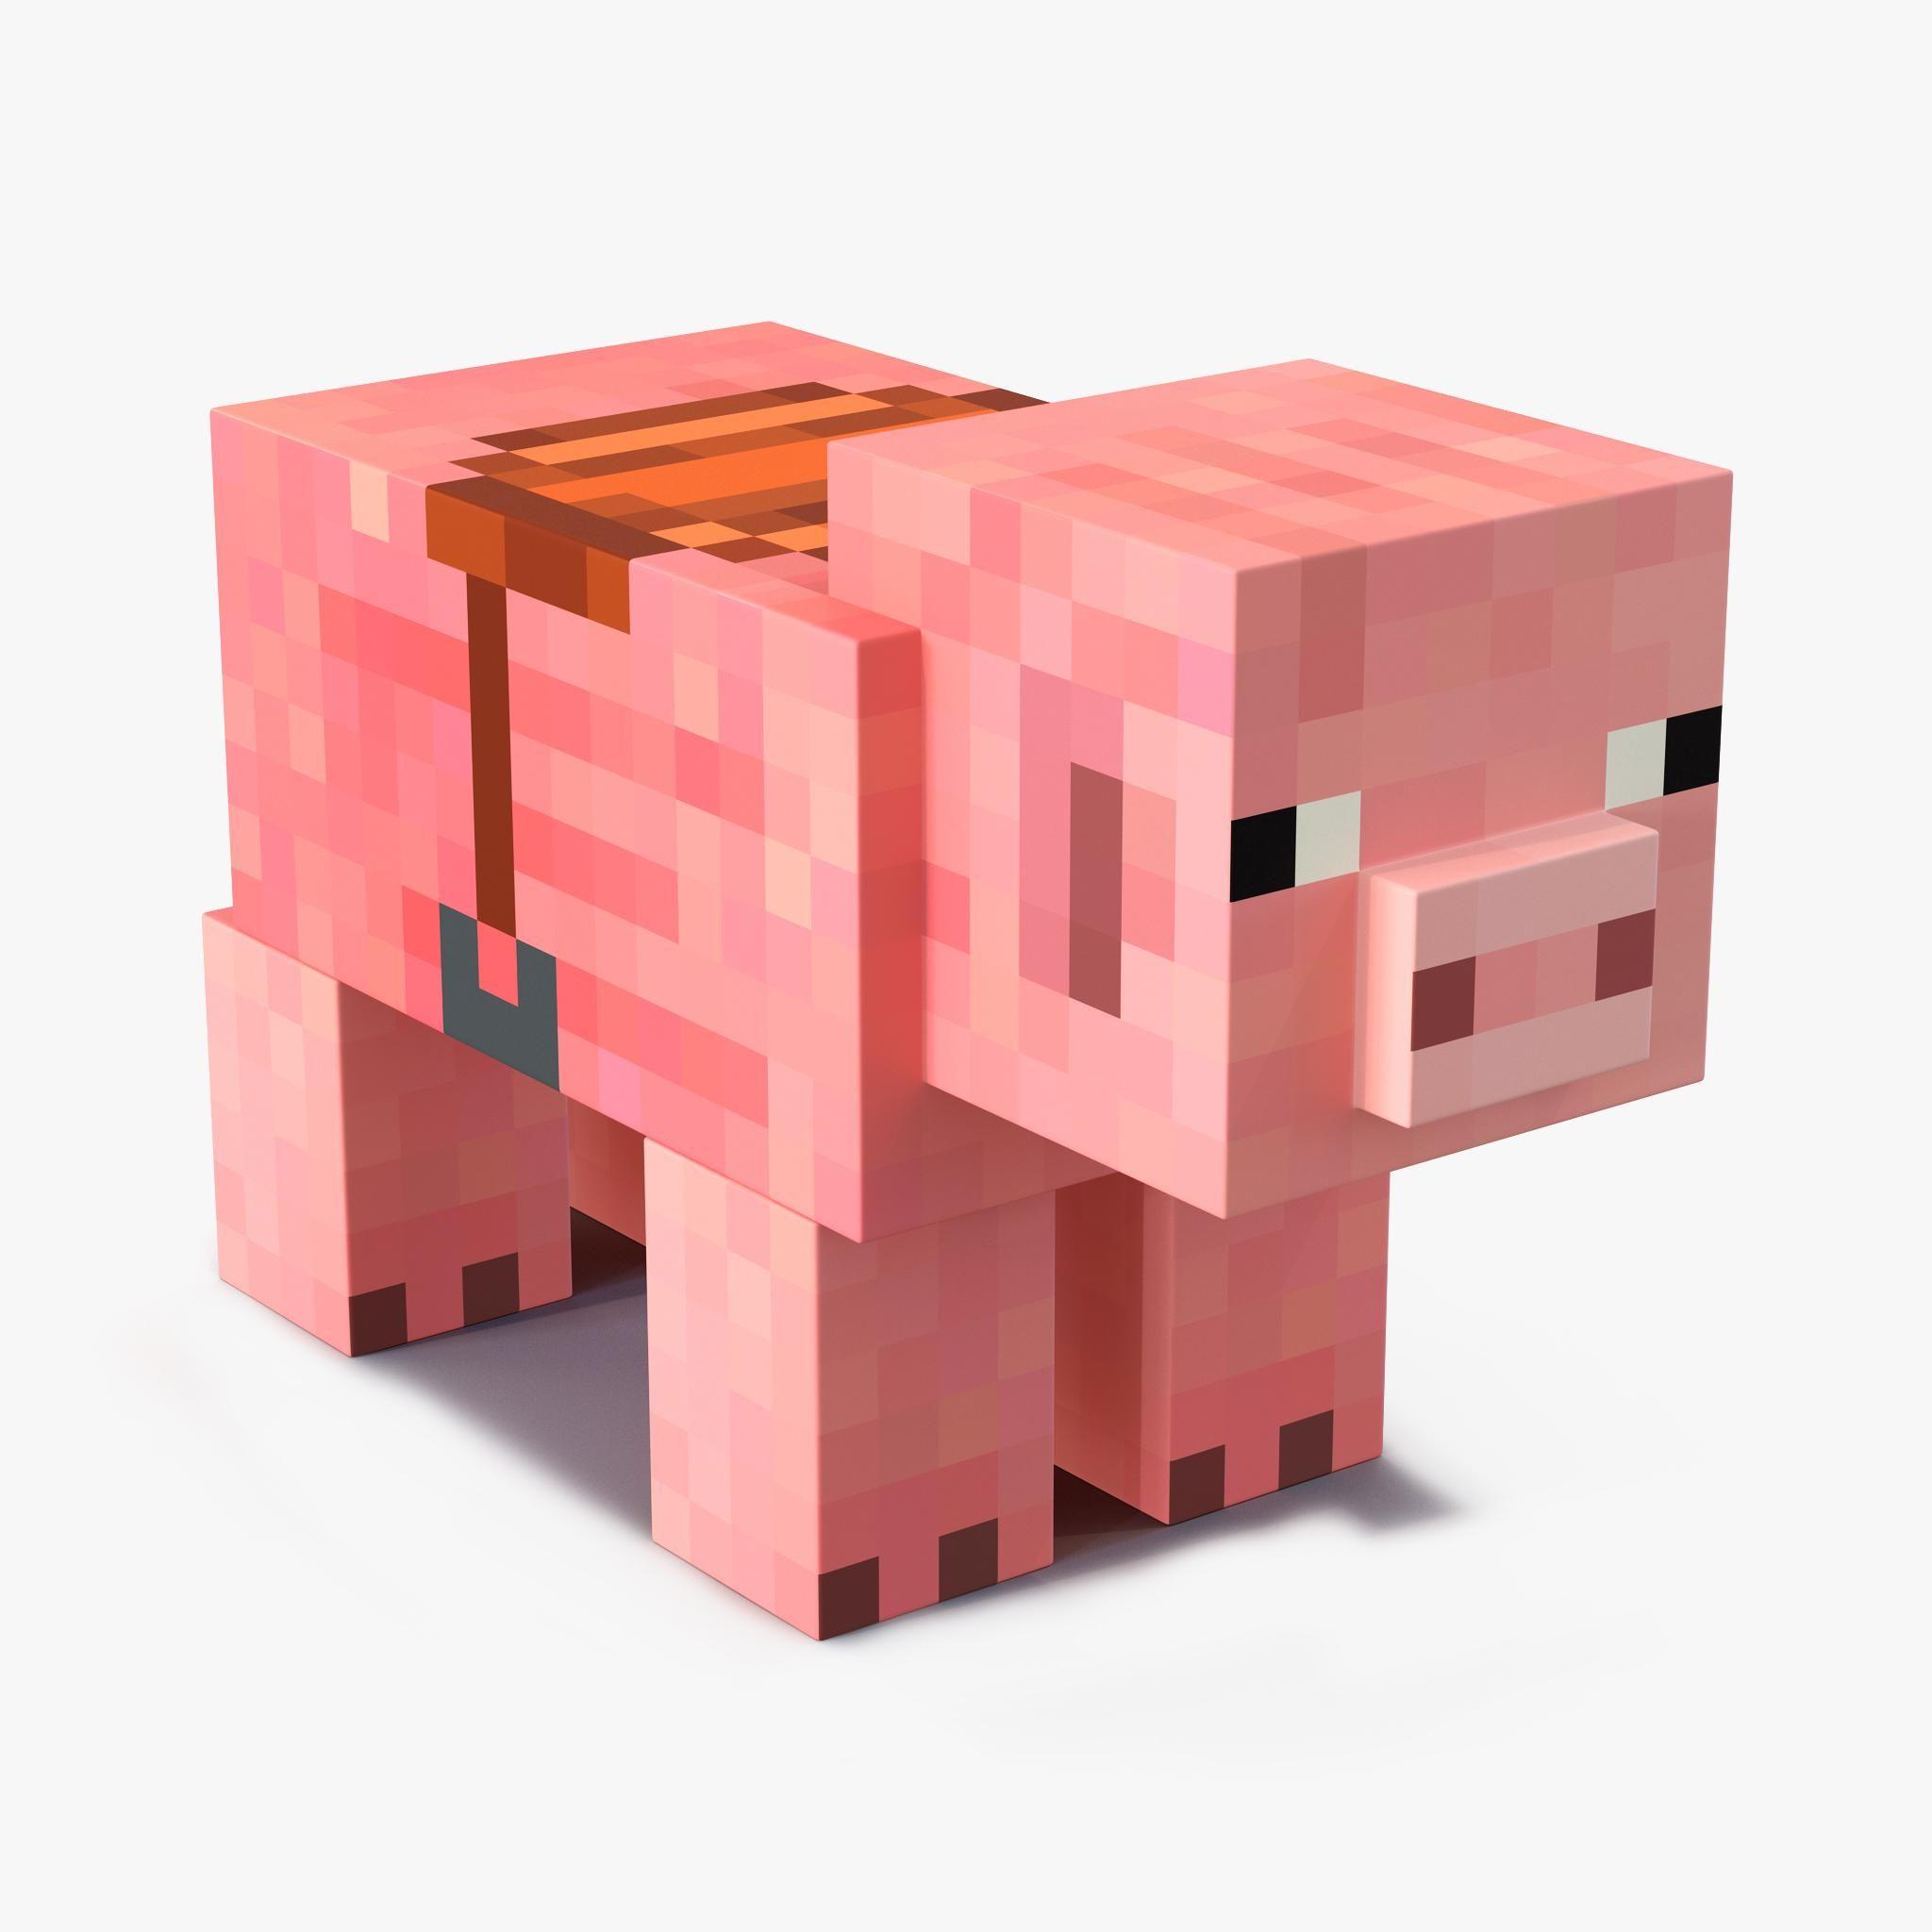 Minecraft Pig with Saddle 9D Model #AD ,#Pig#Minecraft#Model